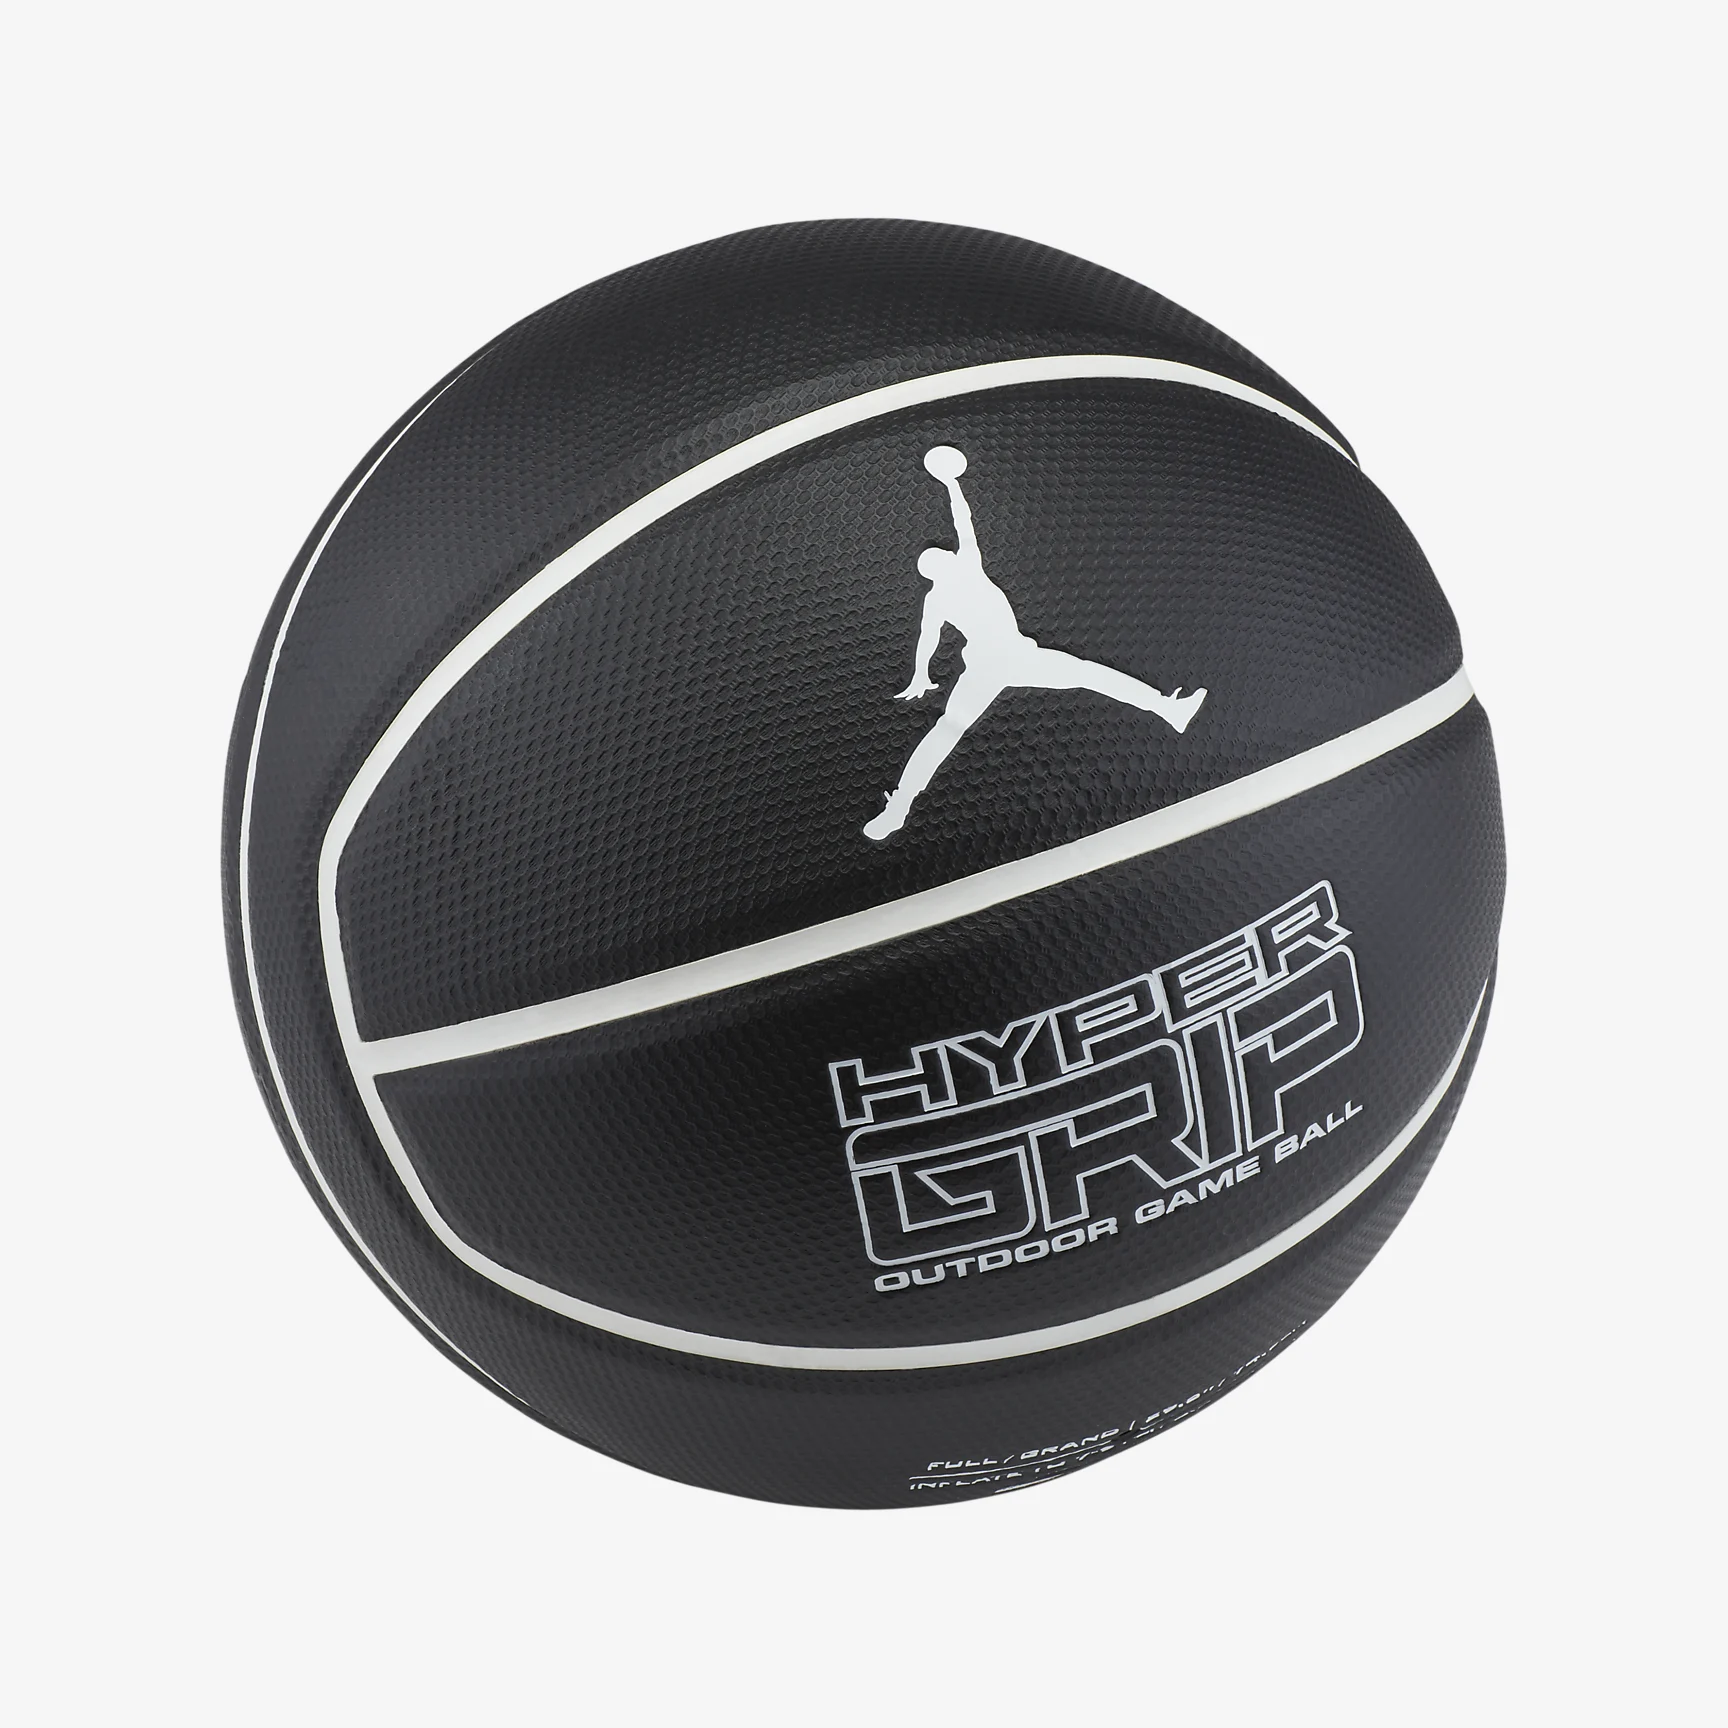 Nike 耐克 Jordan HyperGrip 4P 篮球 7号